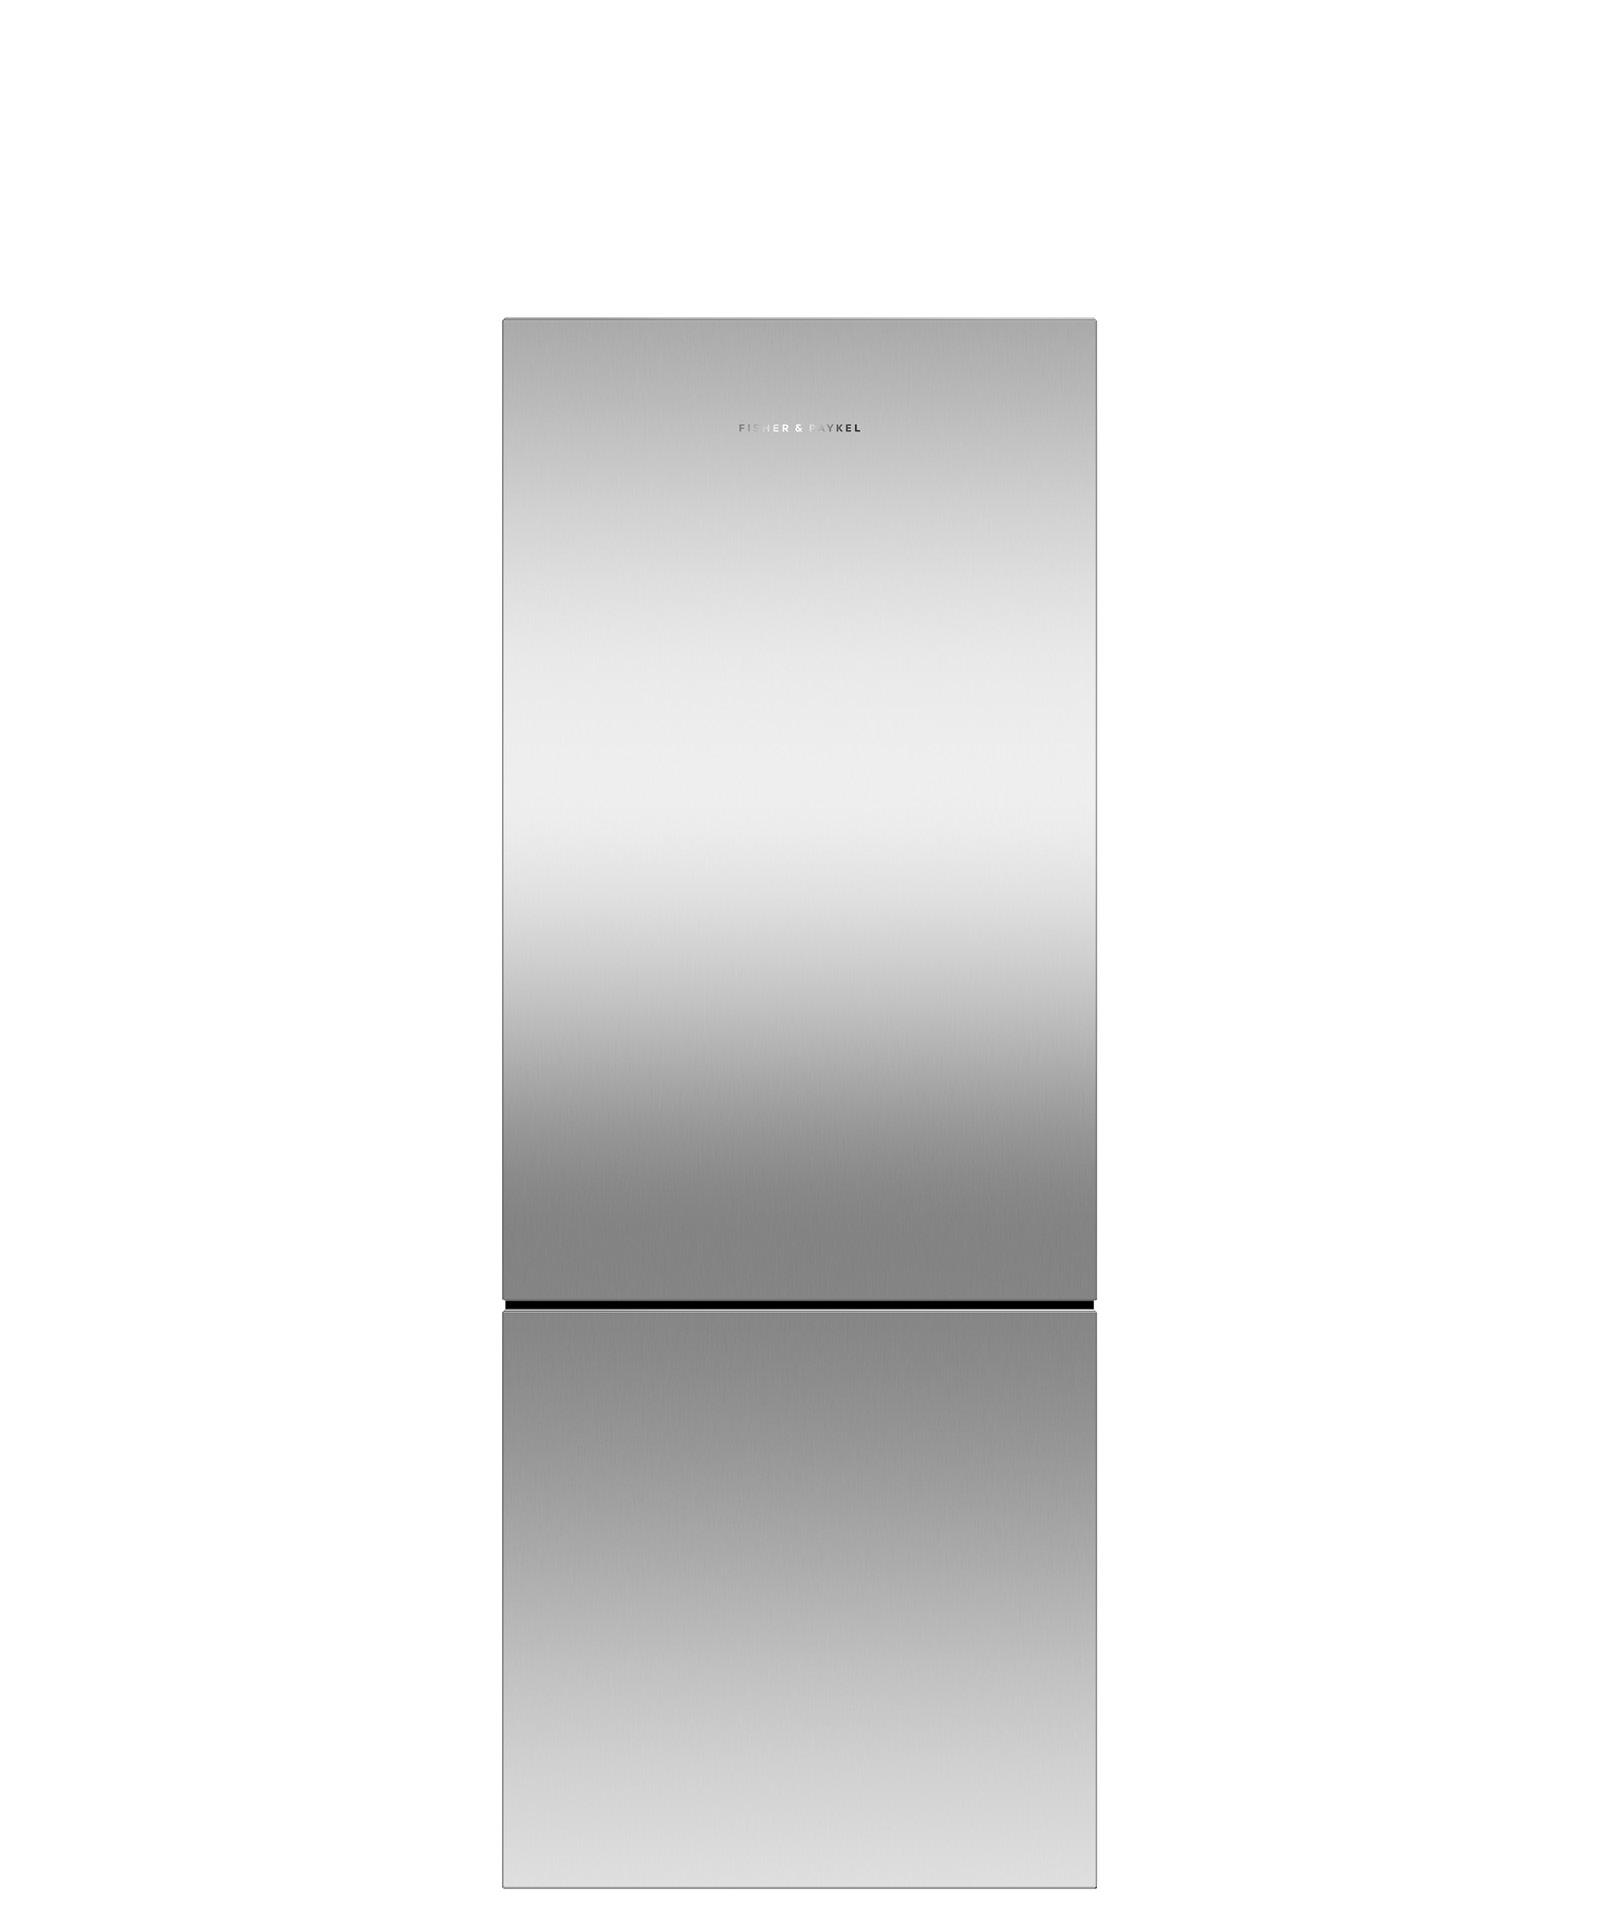 Model: RF135BLPX6_N | Counter Depth Refrigerator 13.5 cu ft